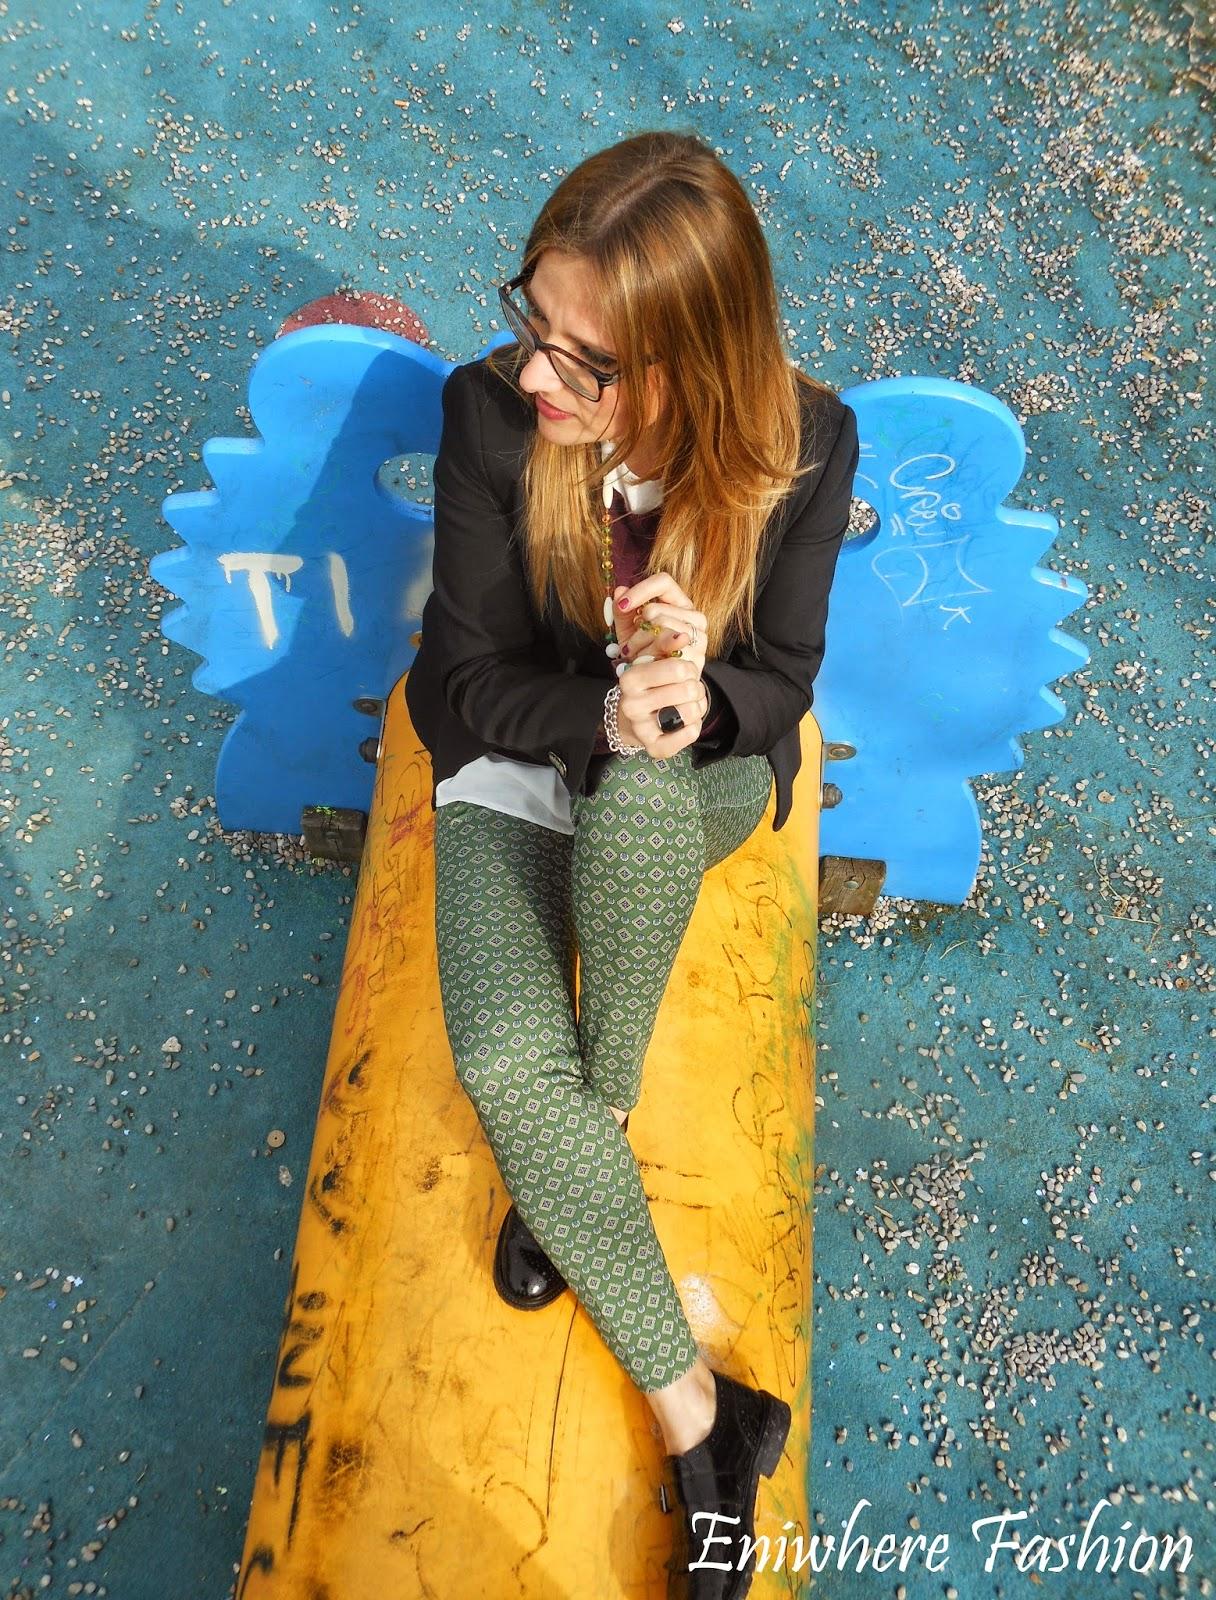 Eniwhere Fashion - parco giochi - Zara